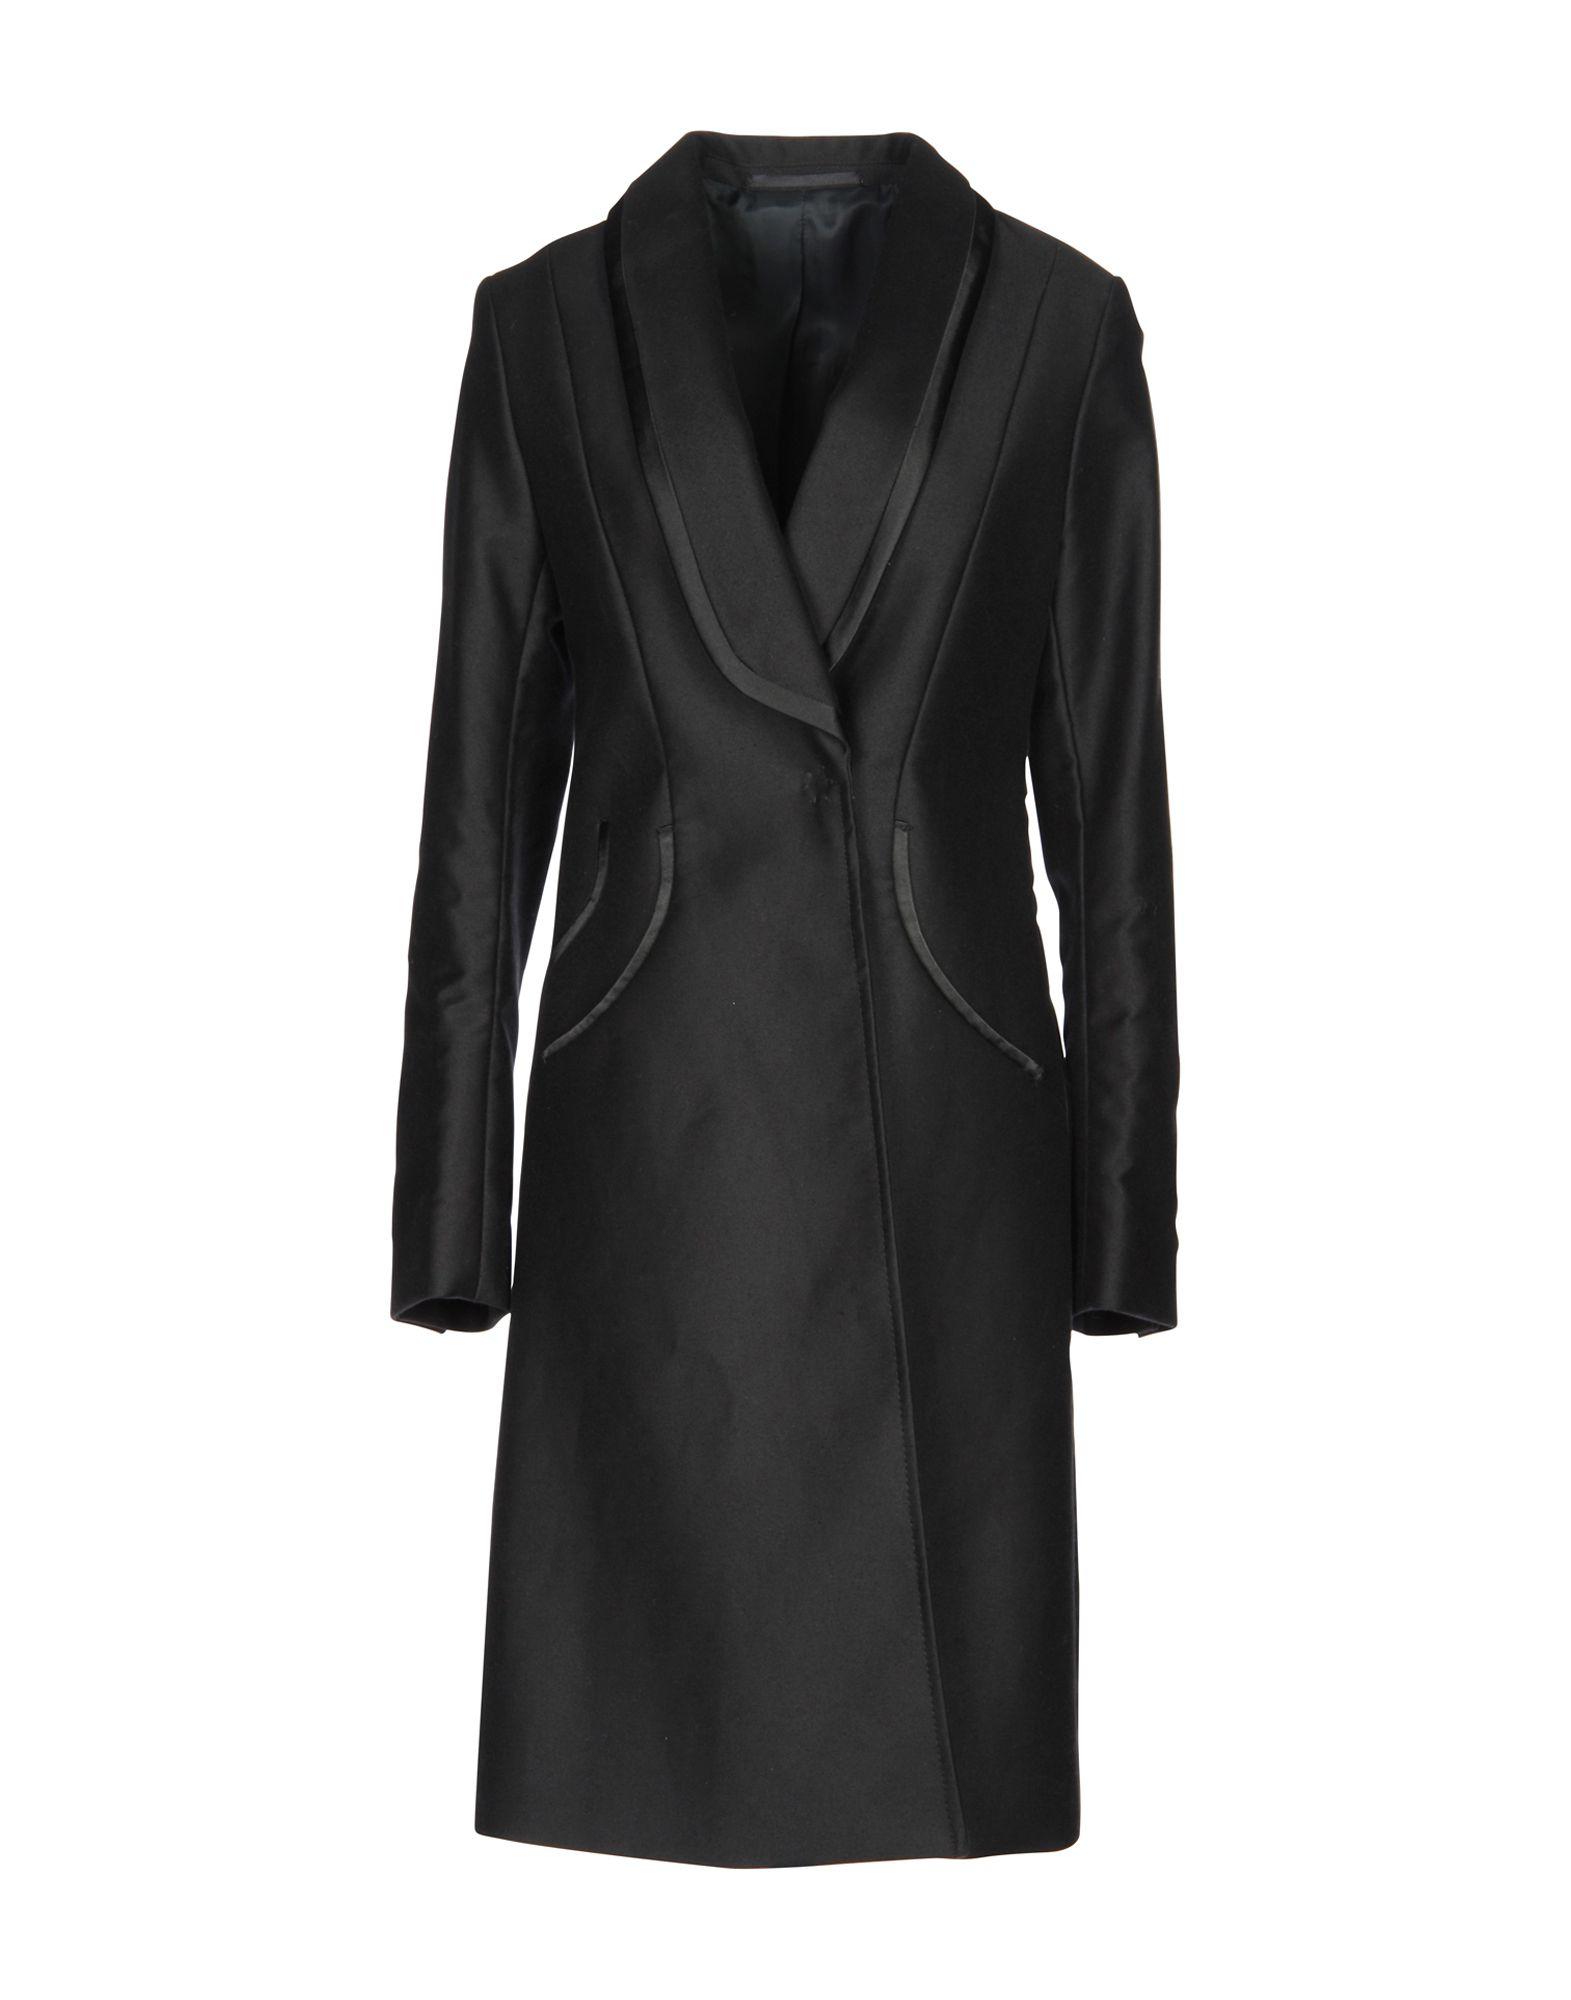 CLEMENS EN AUGUST Coat in Black